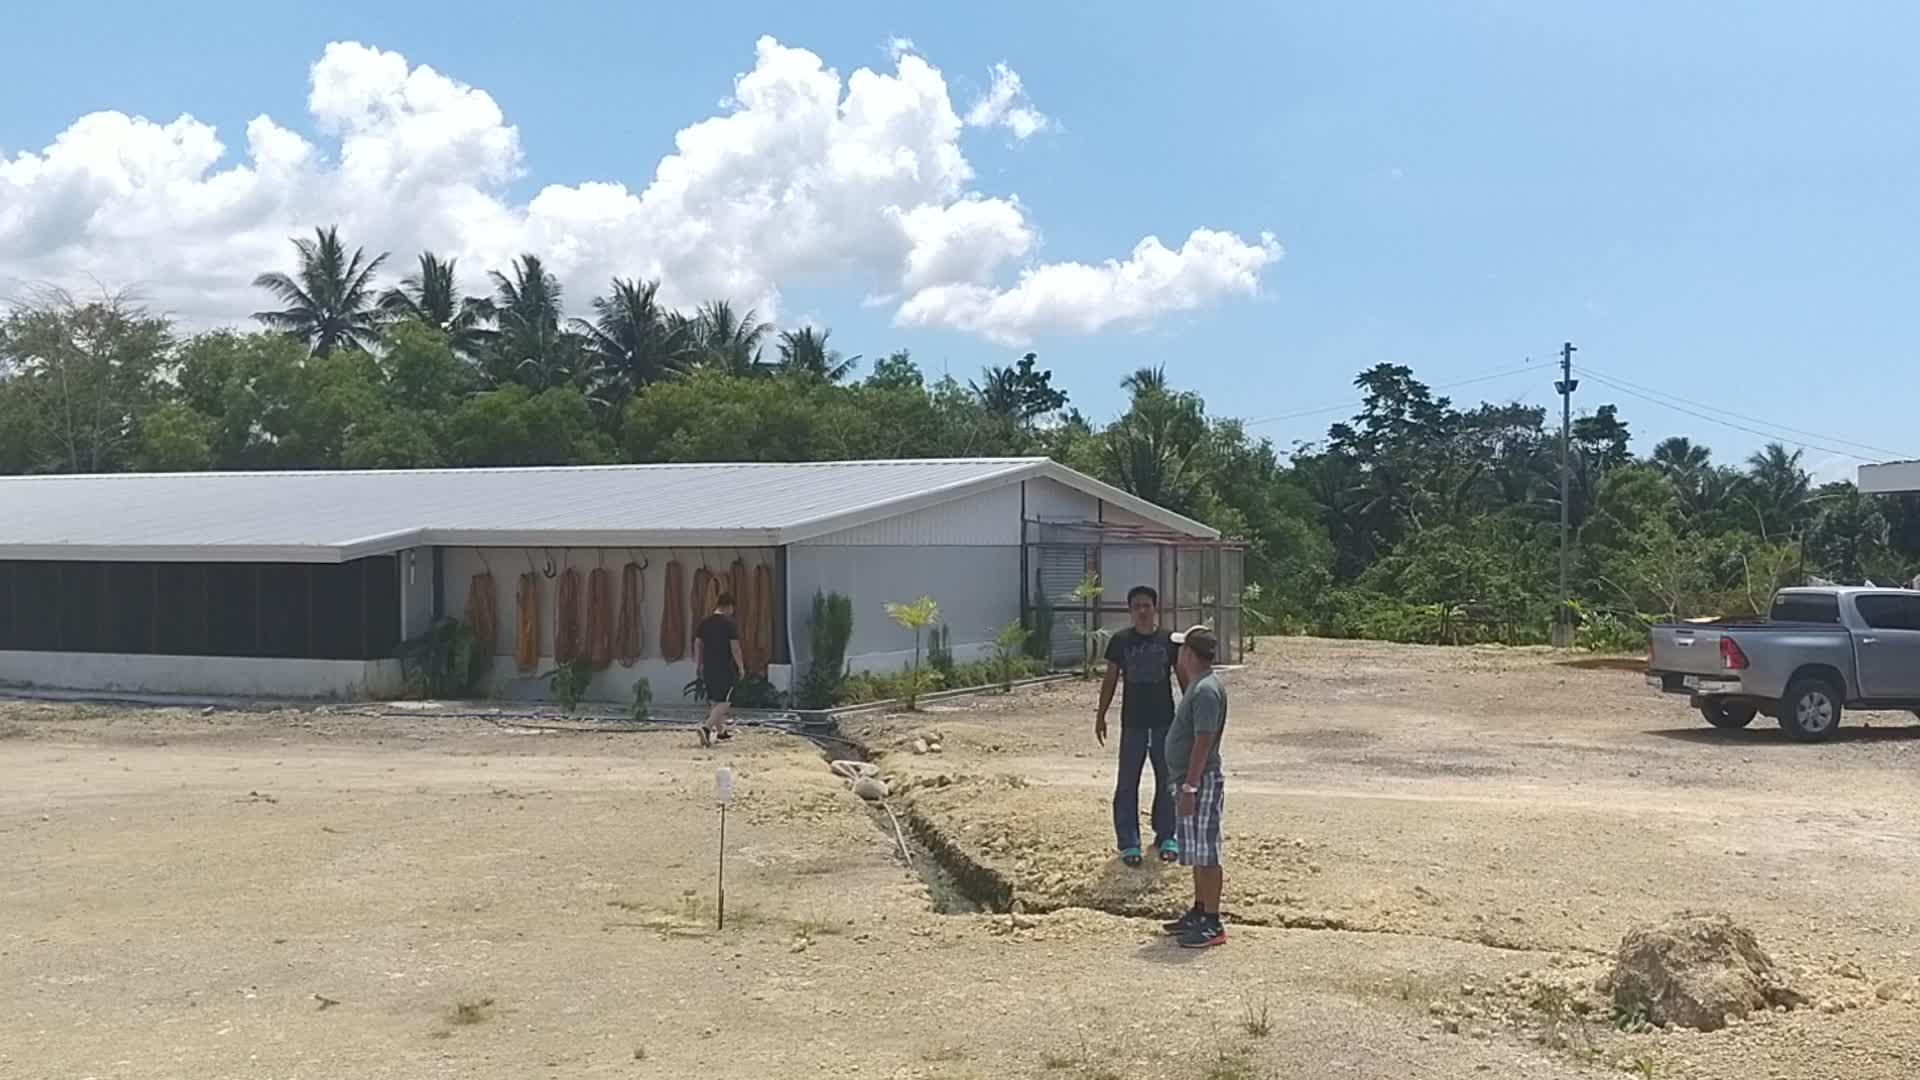 Prefabricated บ้านไก่/โครงสร้างเหล็กฟาร์ม shed พร้อมอุปกรณ์